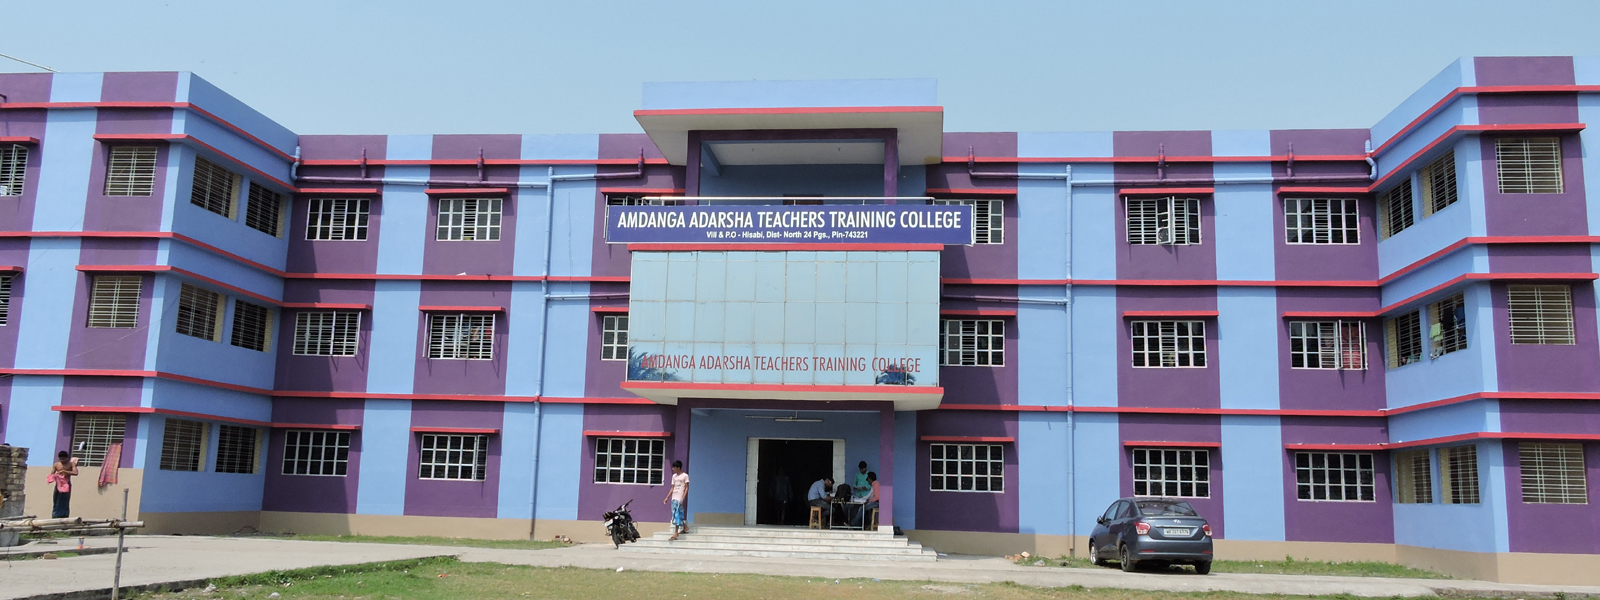 Amdanga Adarsha Teachers Training College, 24 Parganas (n)